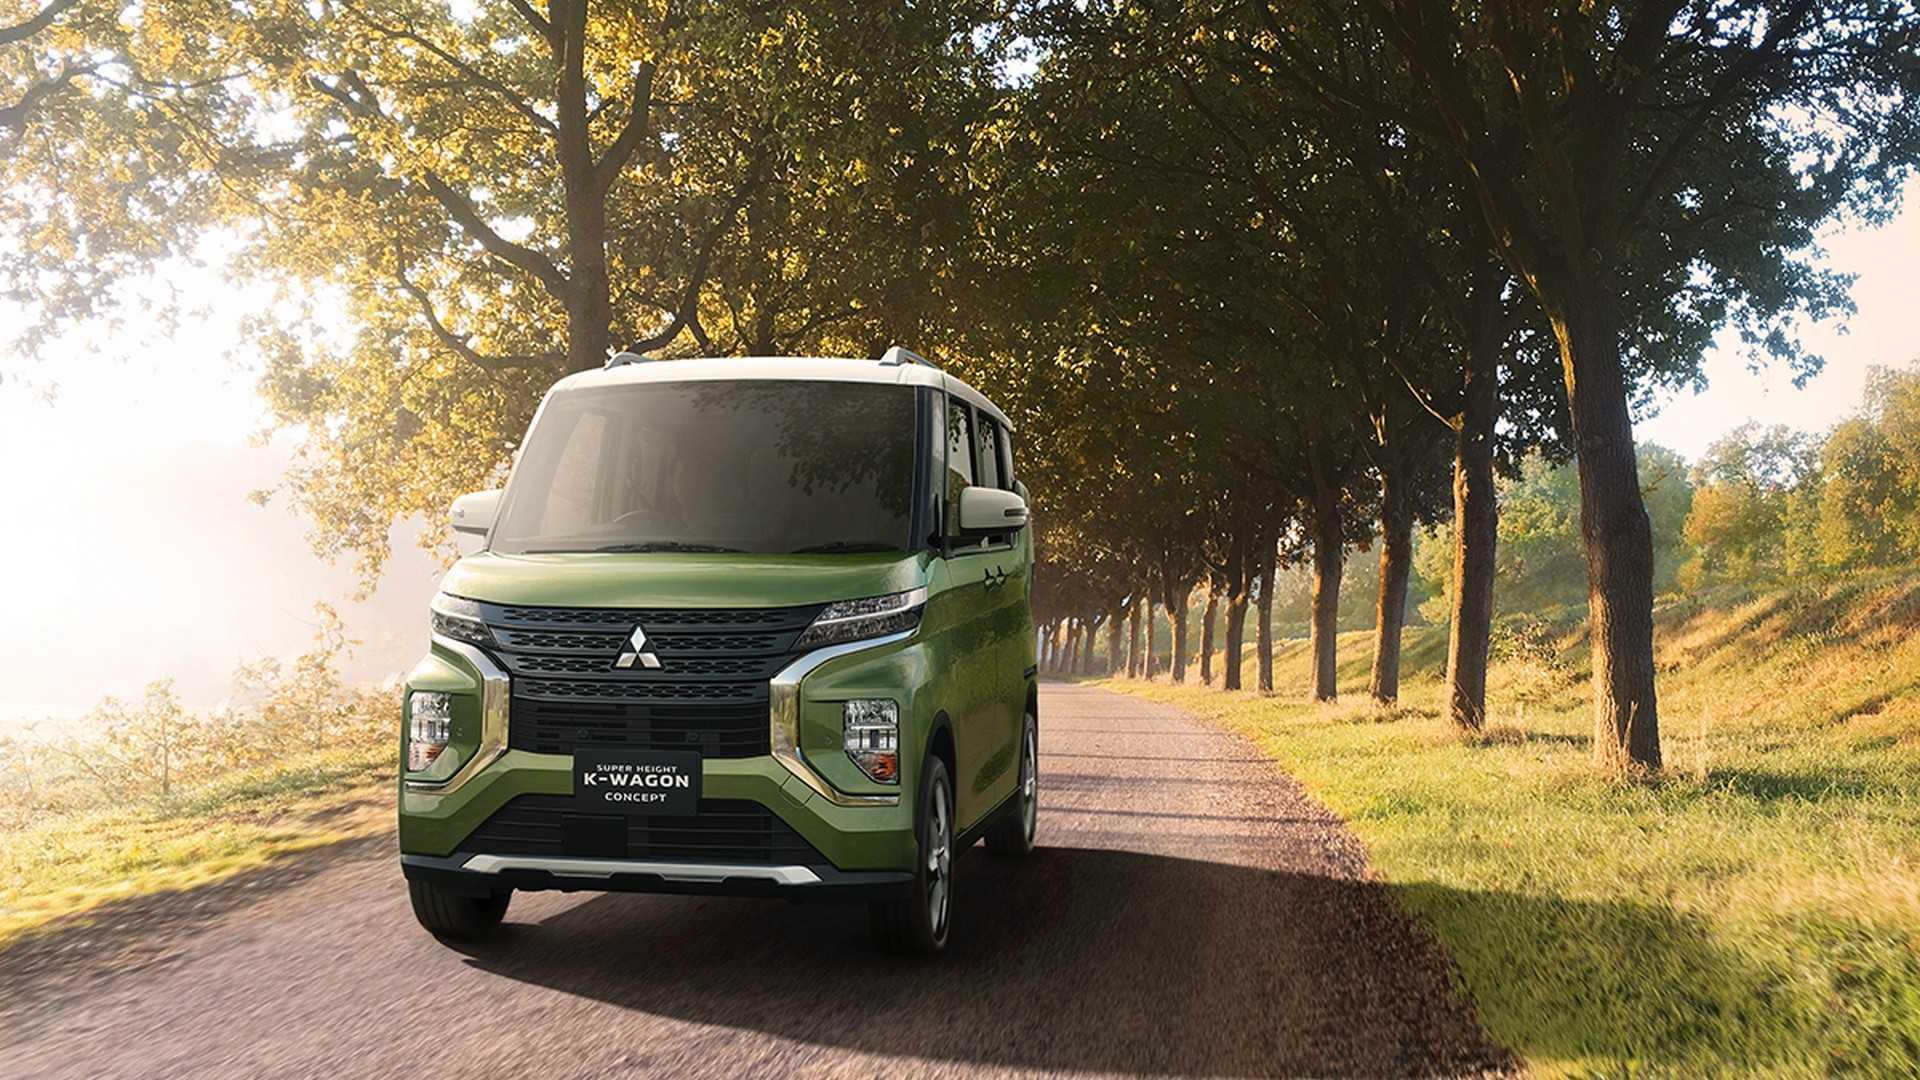 mitsubishi-super-height-k-wagon-concept-1